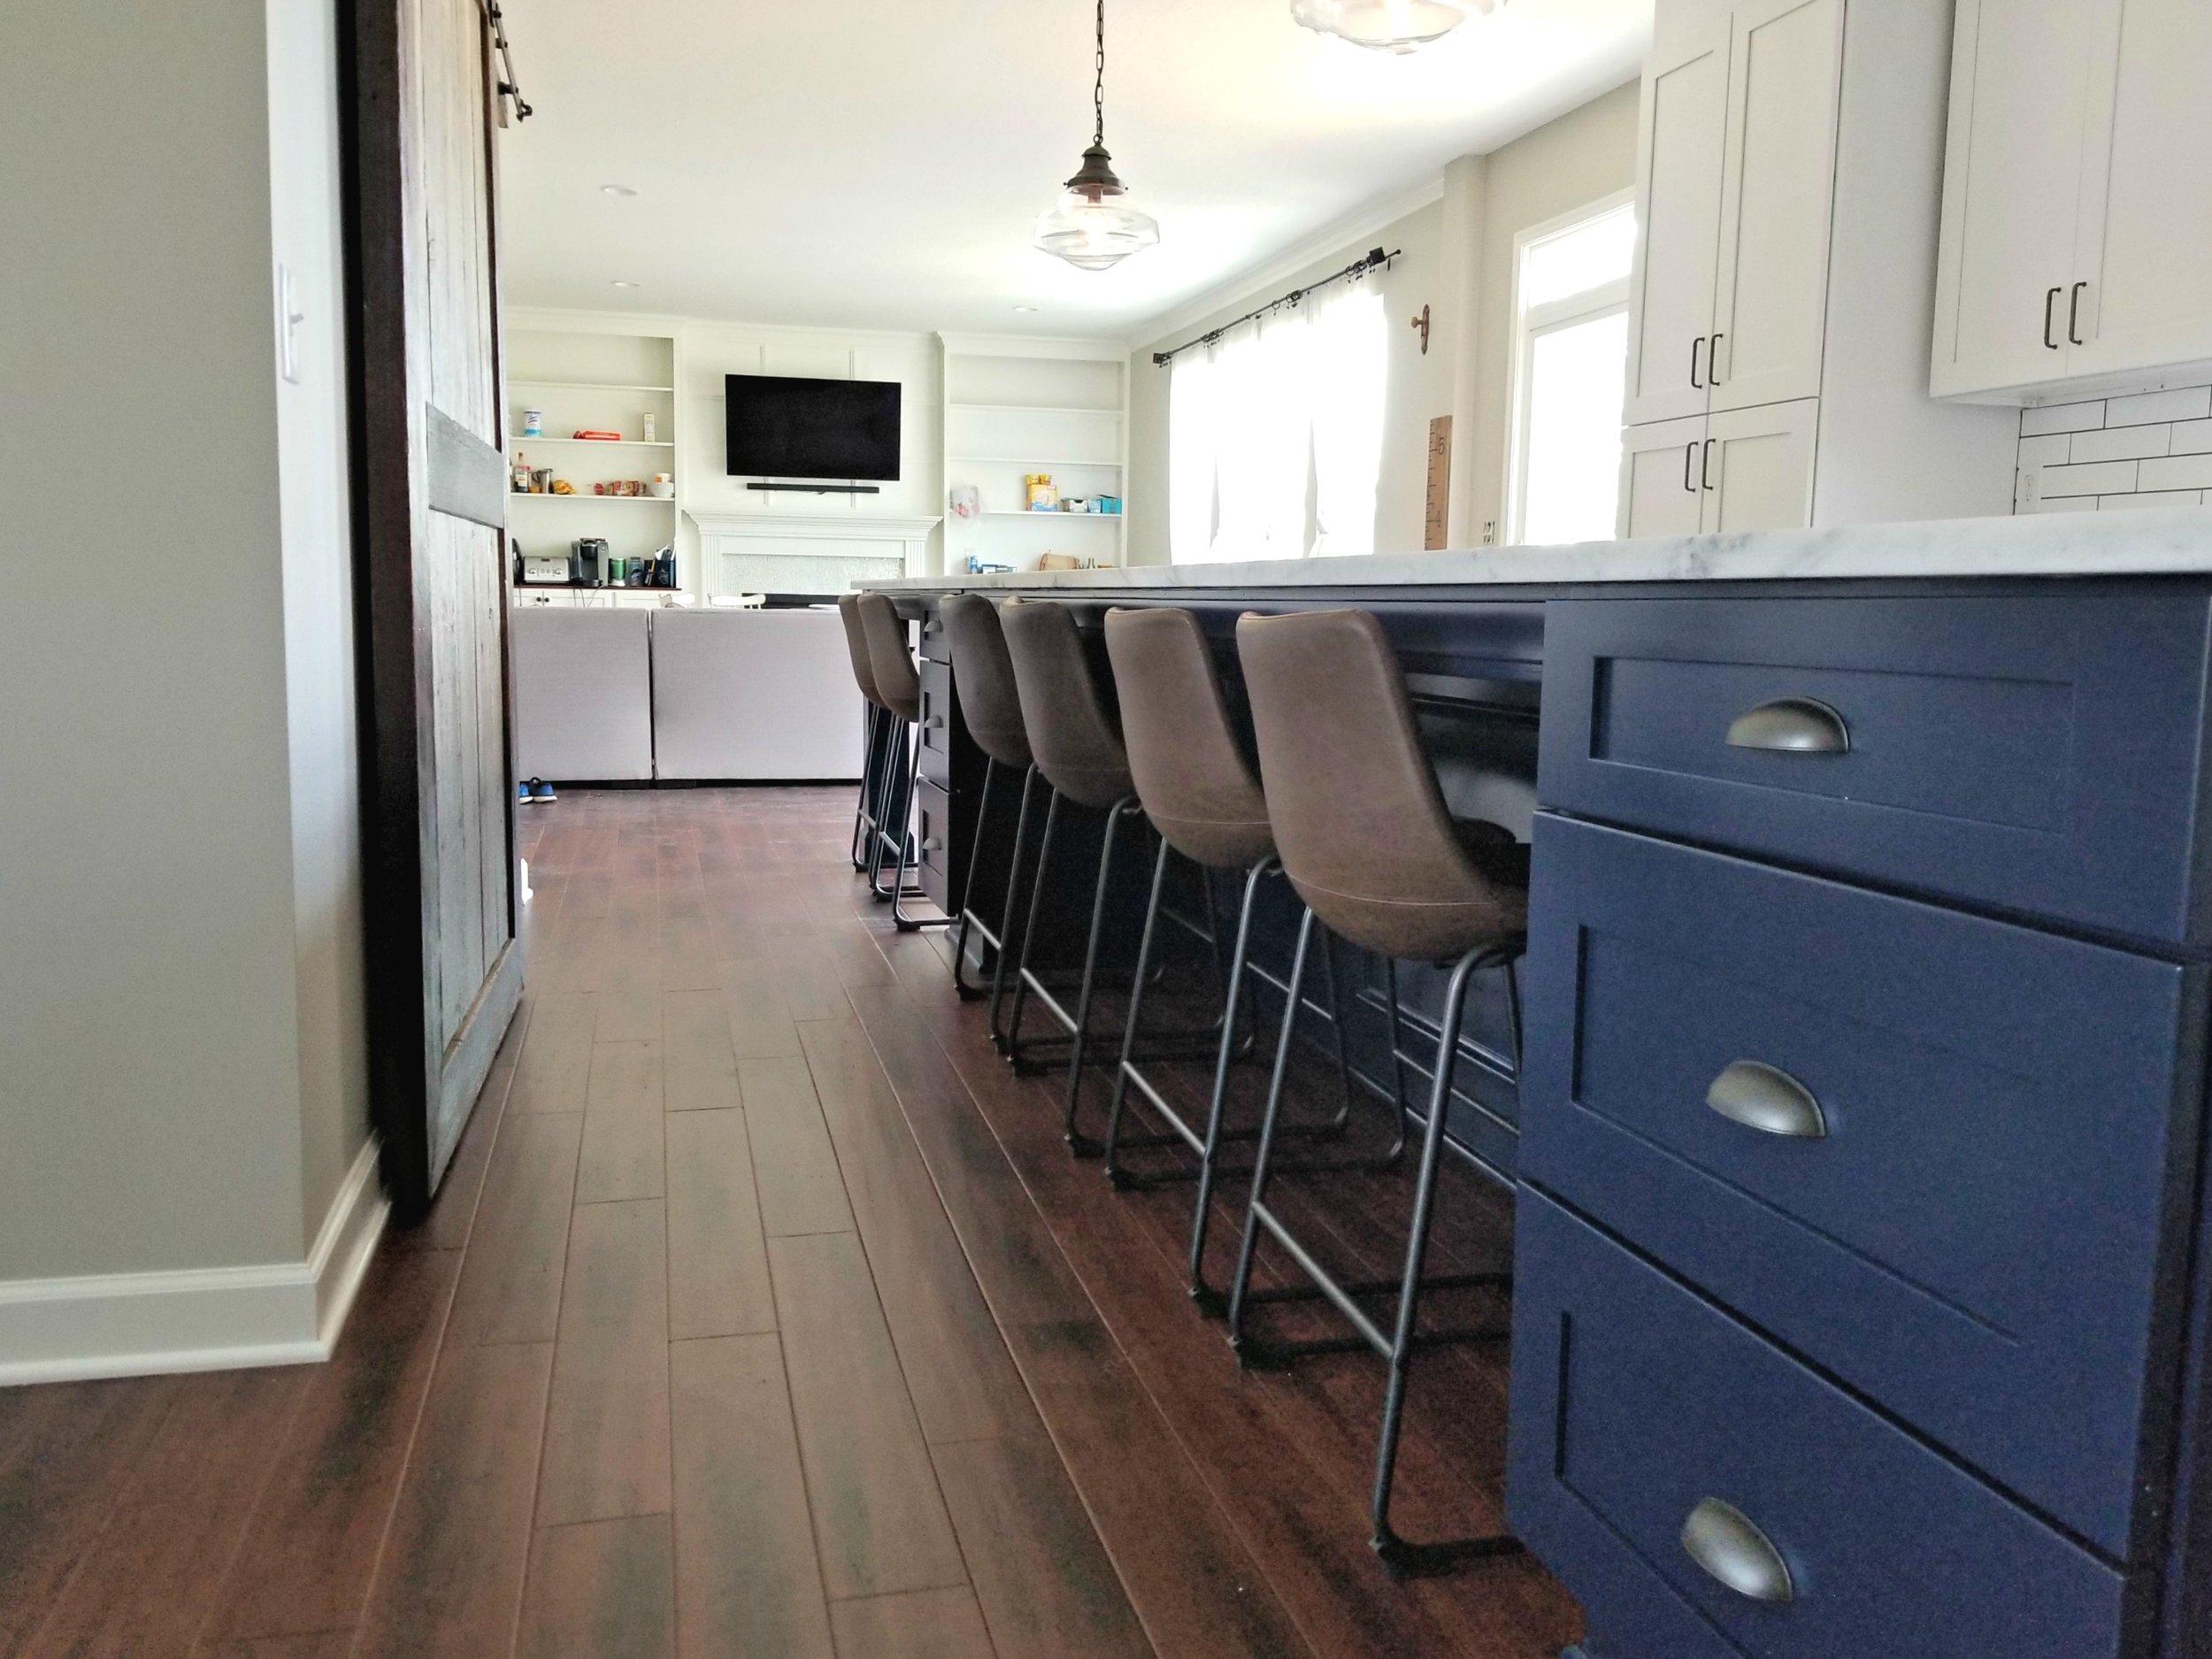 - Custom installed and painted 17-foot islandHardwood floors